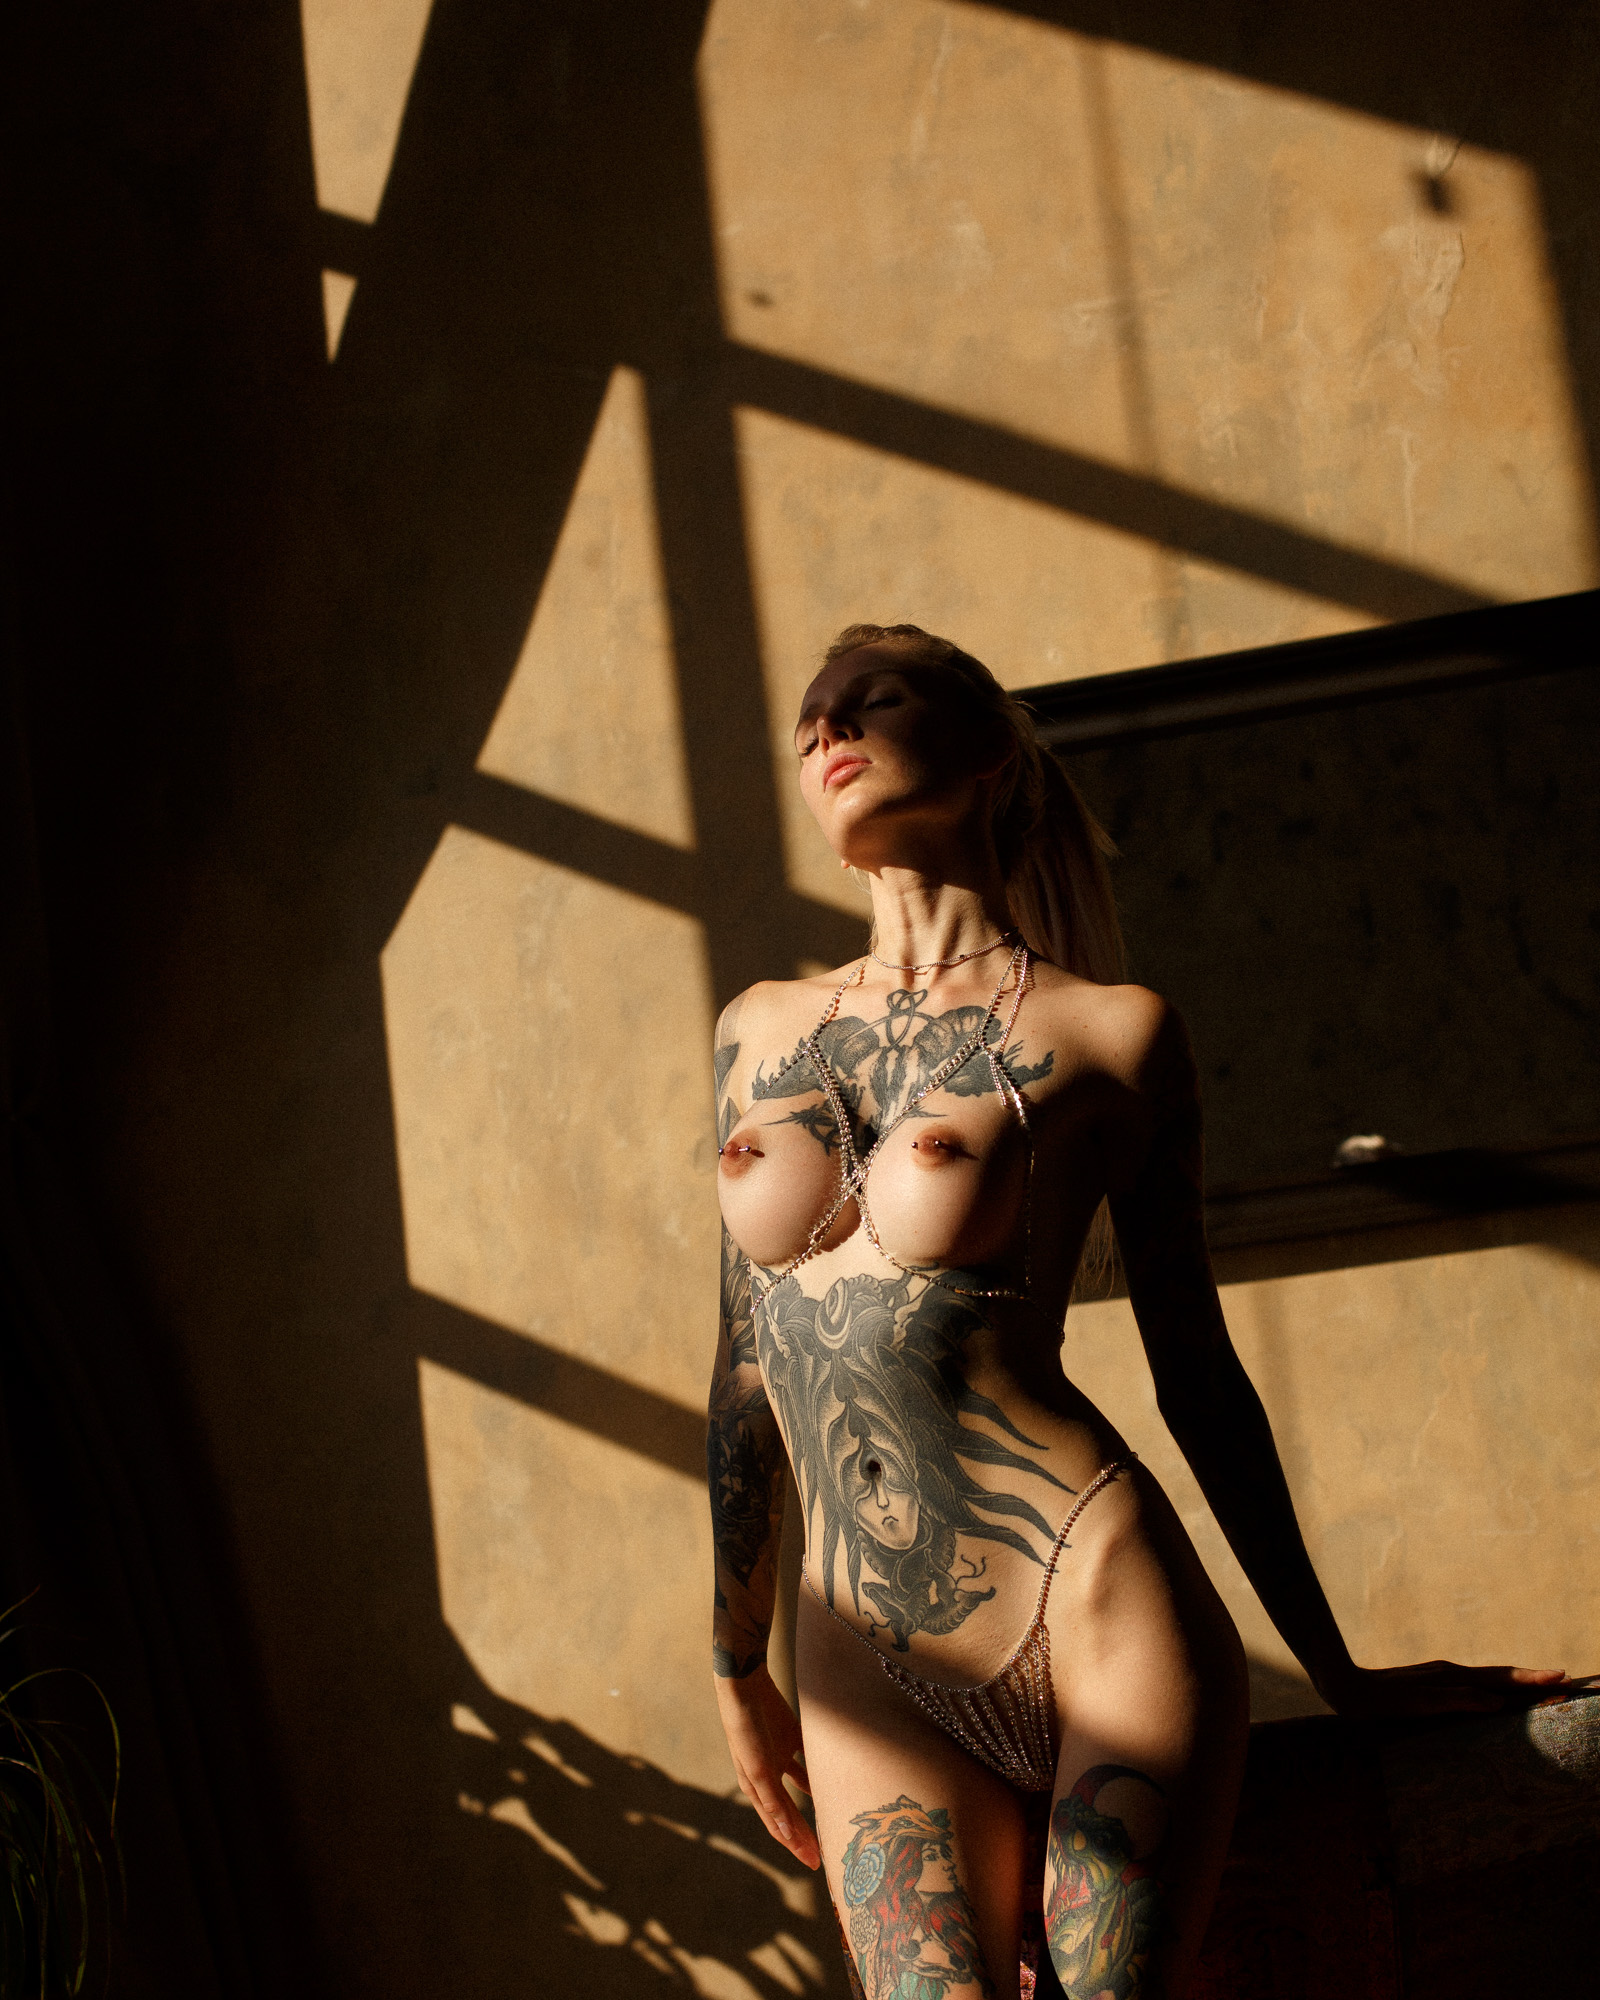 Alena German - Igor Shevchuk photoshoot